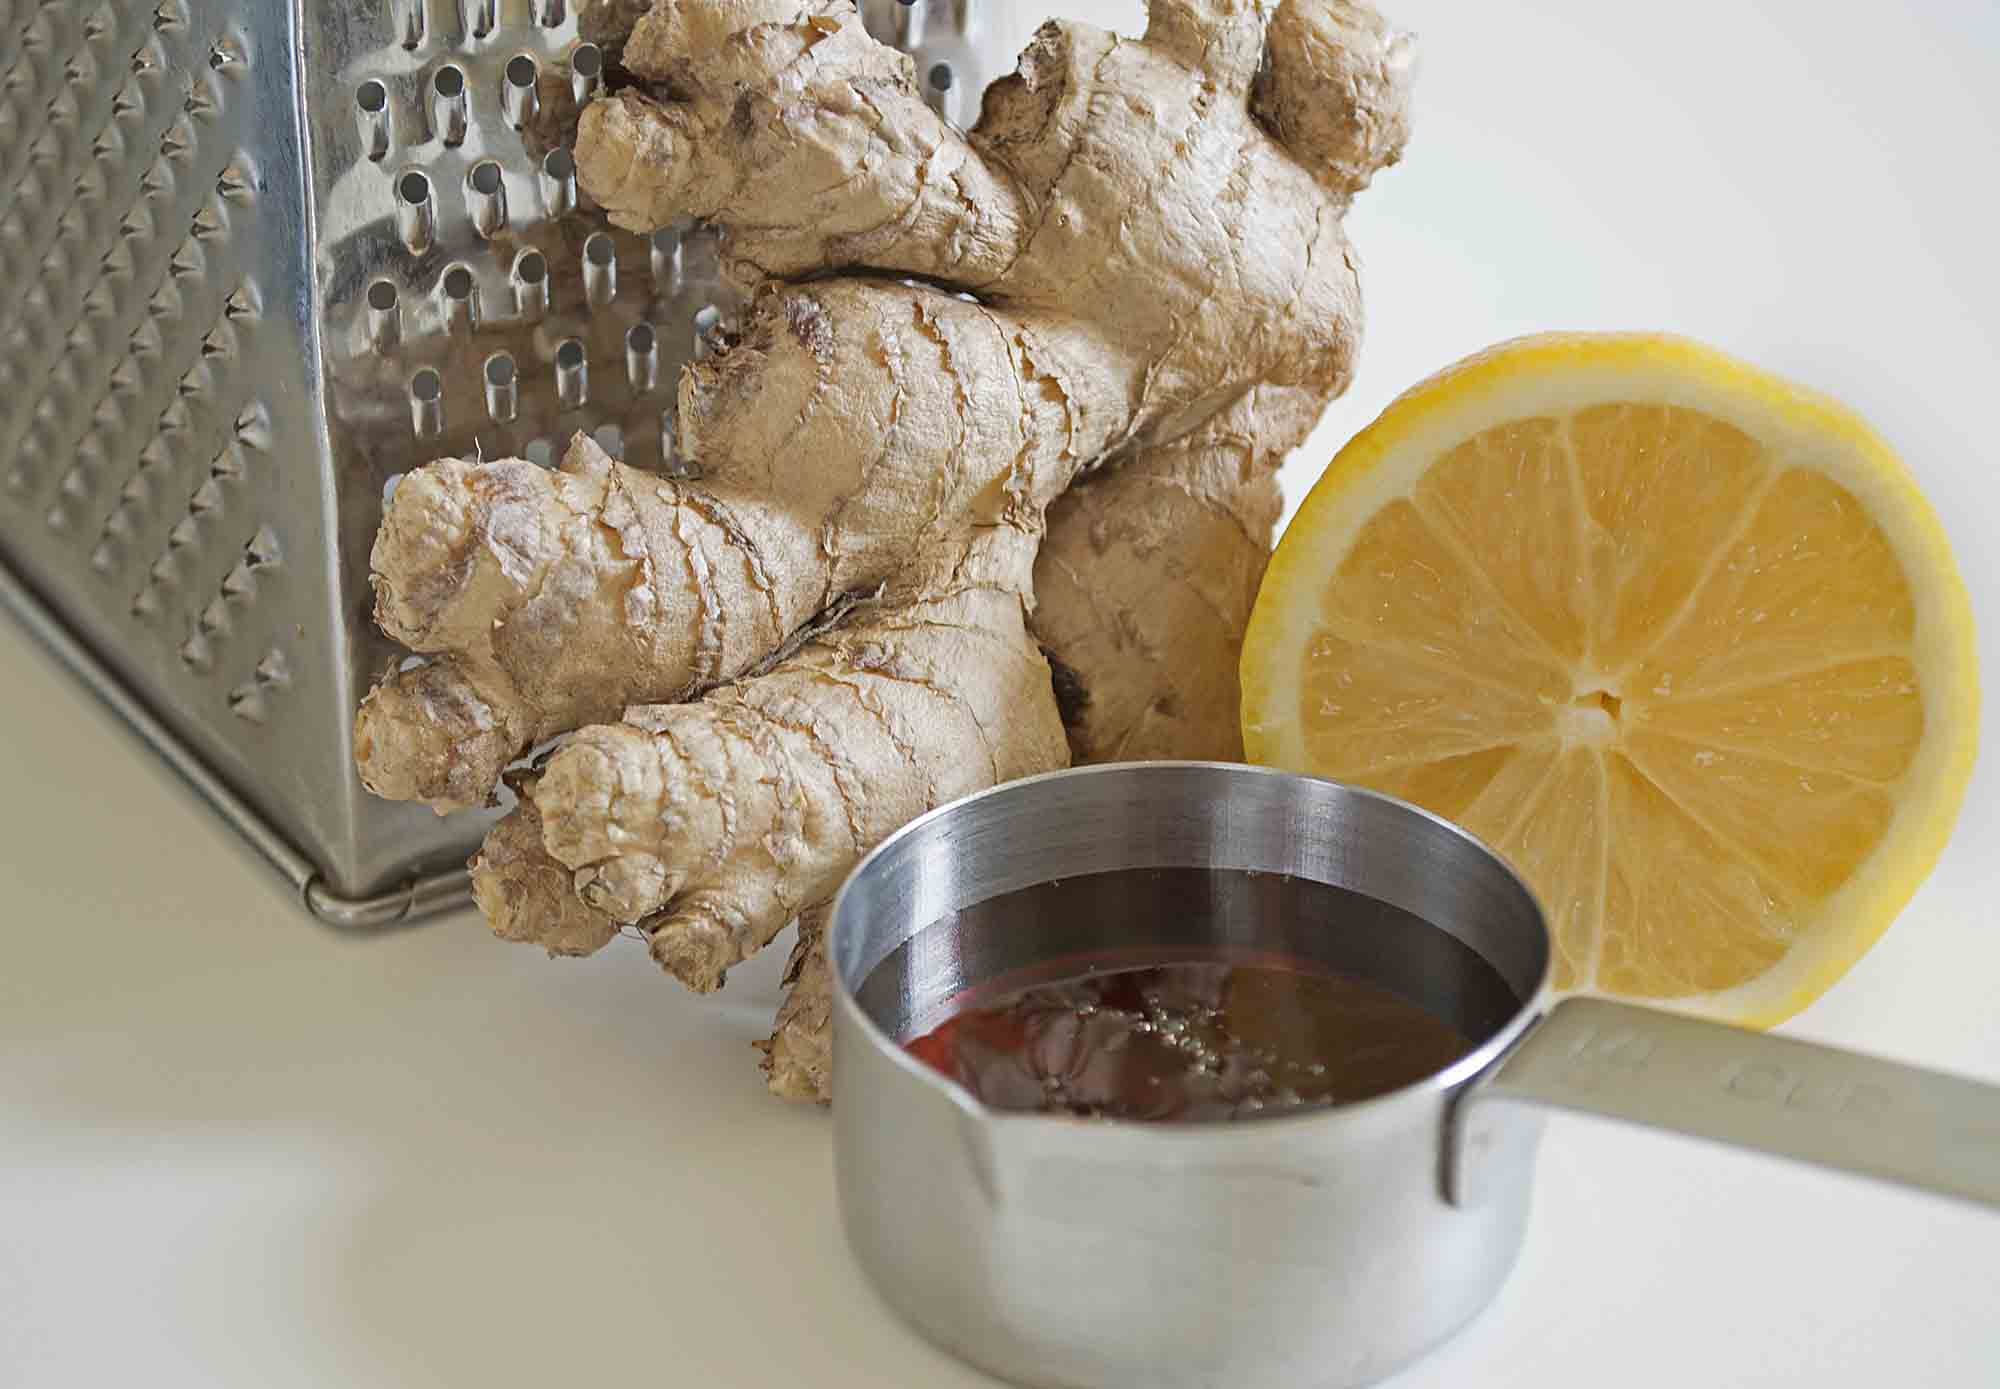 Lemon and Ginger Tea Ingredients